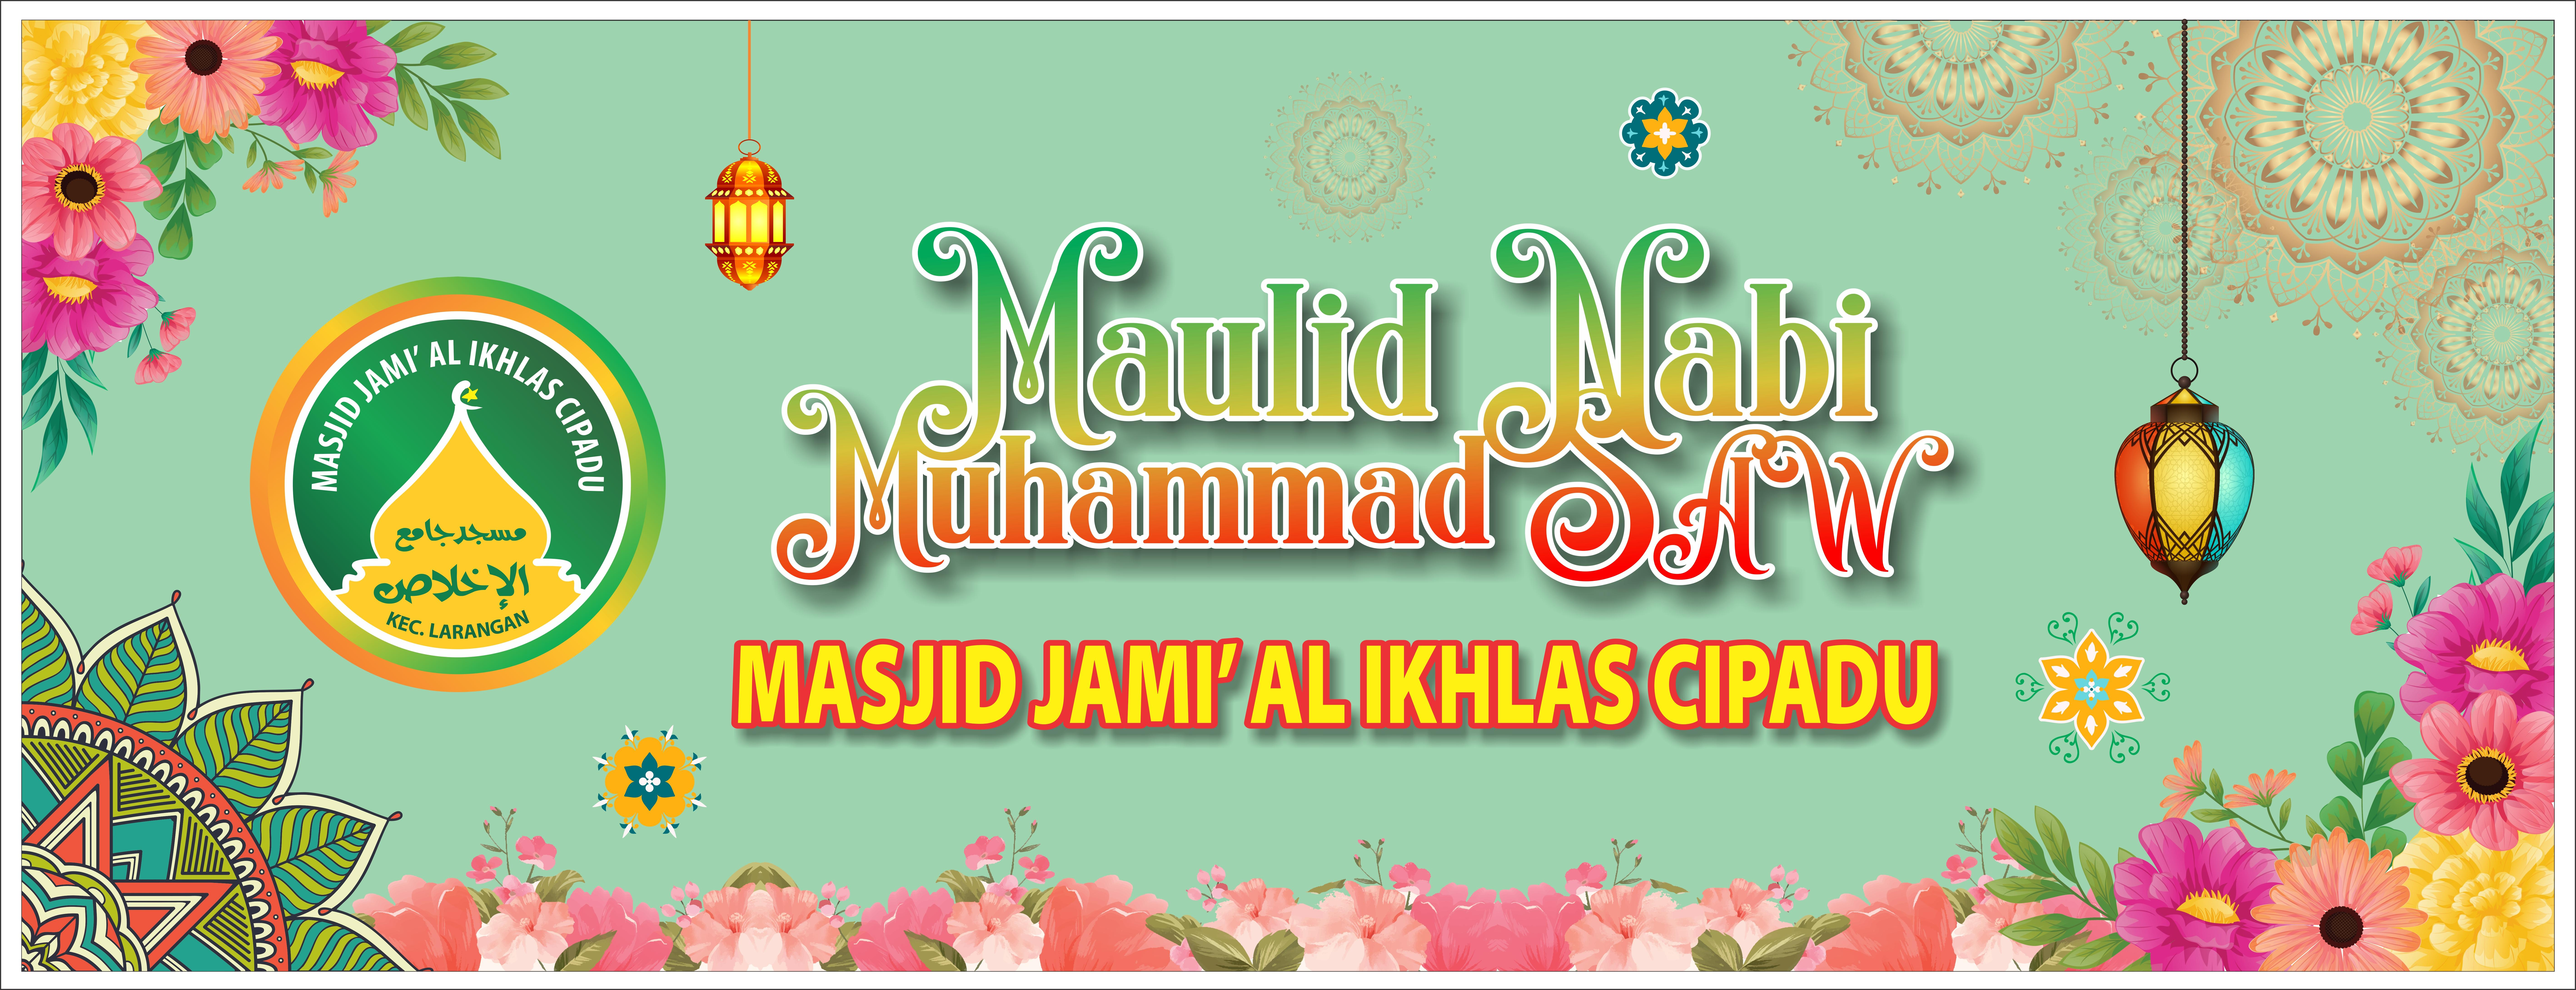 BD_Maulid Masjid Al Ikhlas 1441_400 x 150_Floral